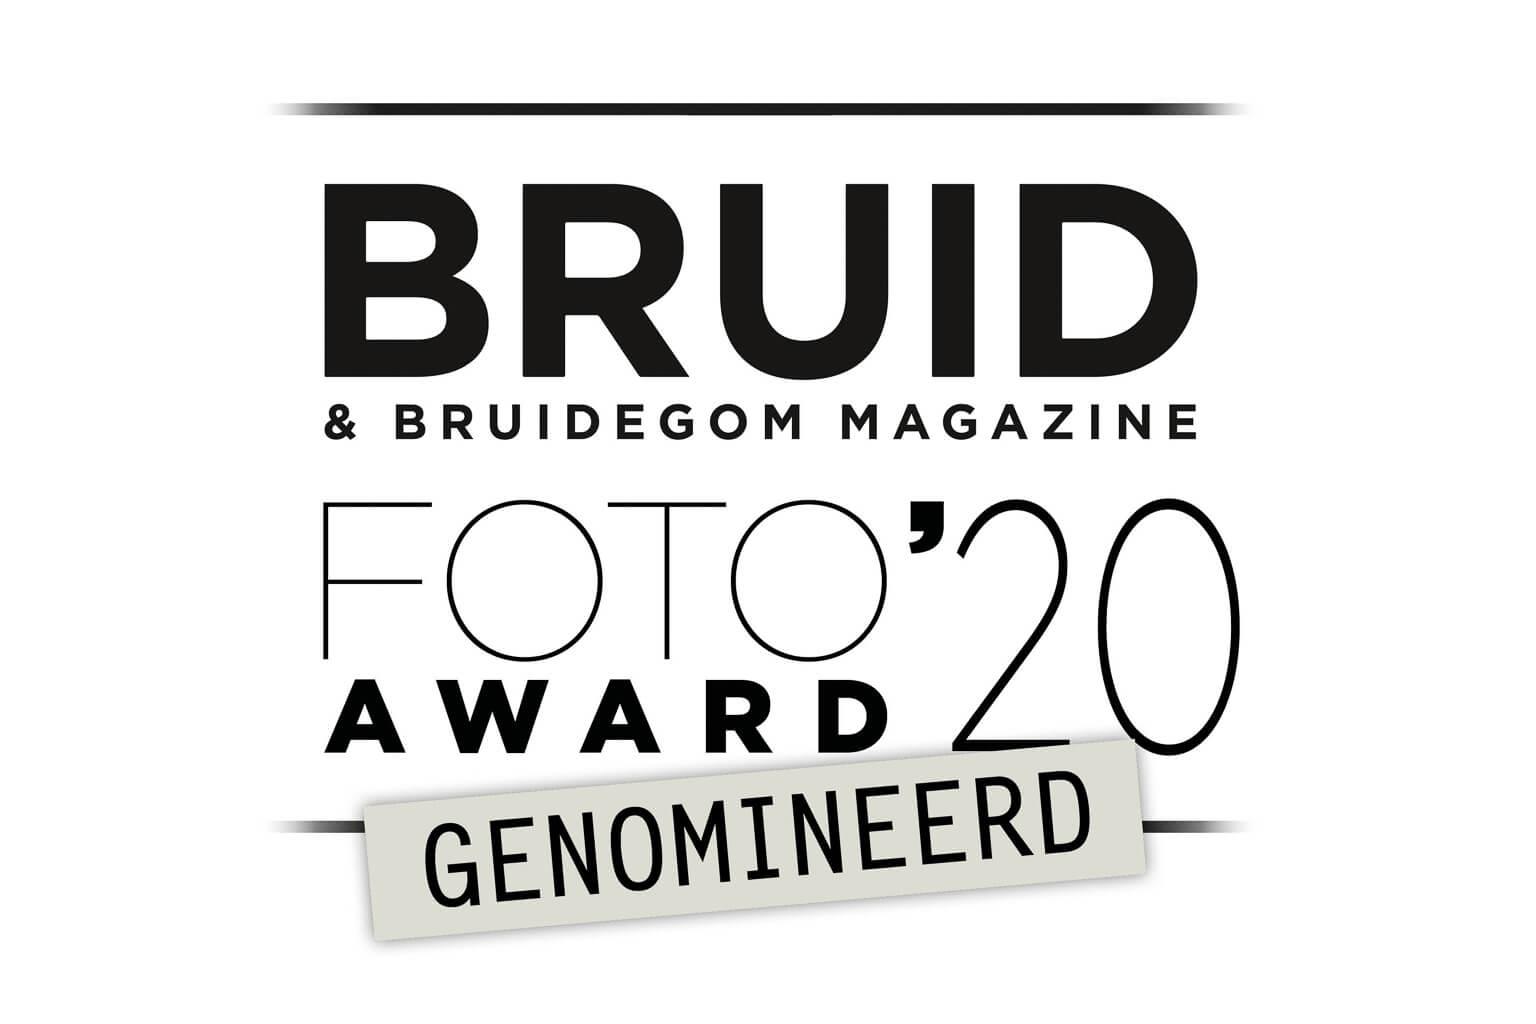 The Wedding Story genomineerd bruidsfoto award 2020